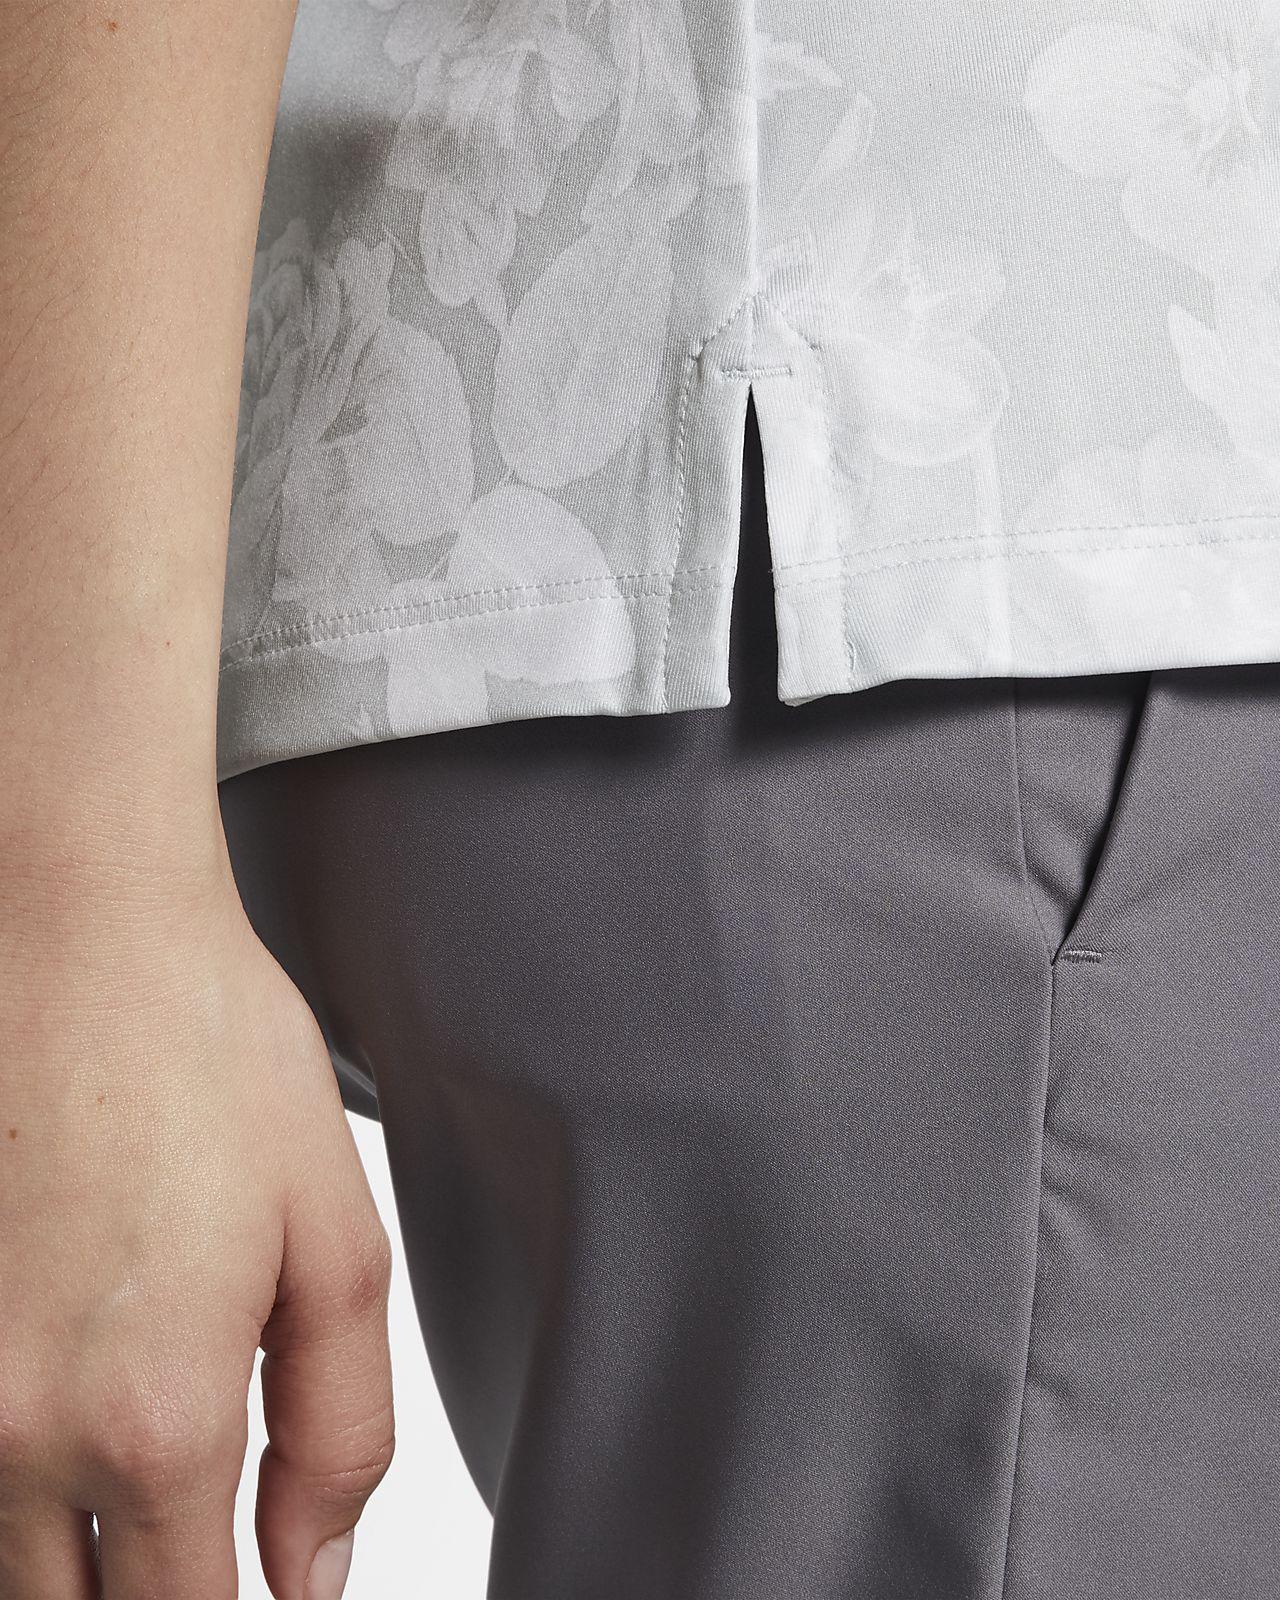 a93655e1e615 Γυναικεία εμπριμέ μπλούζα πόλο για γκολφ Nike Dri-FIT UV. Nike.com GR